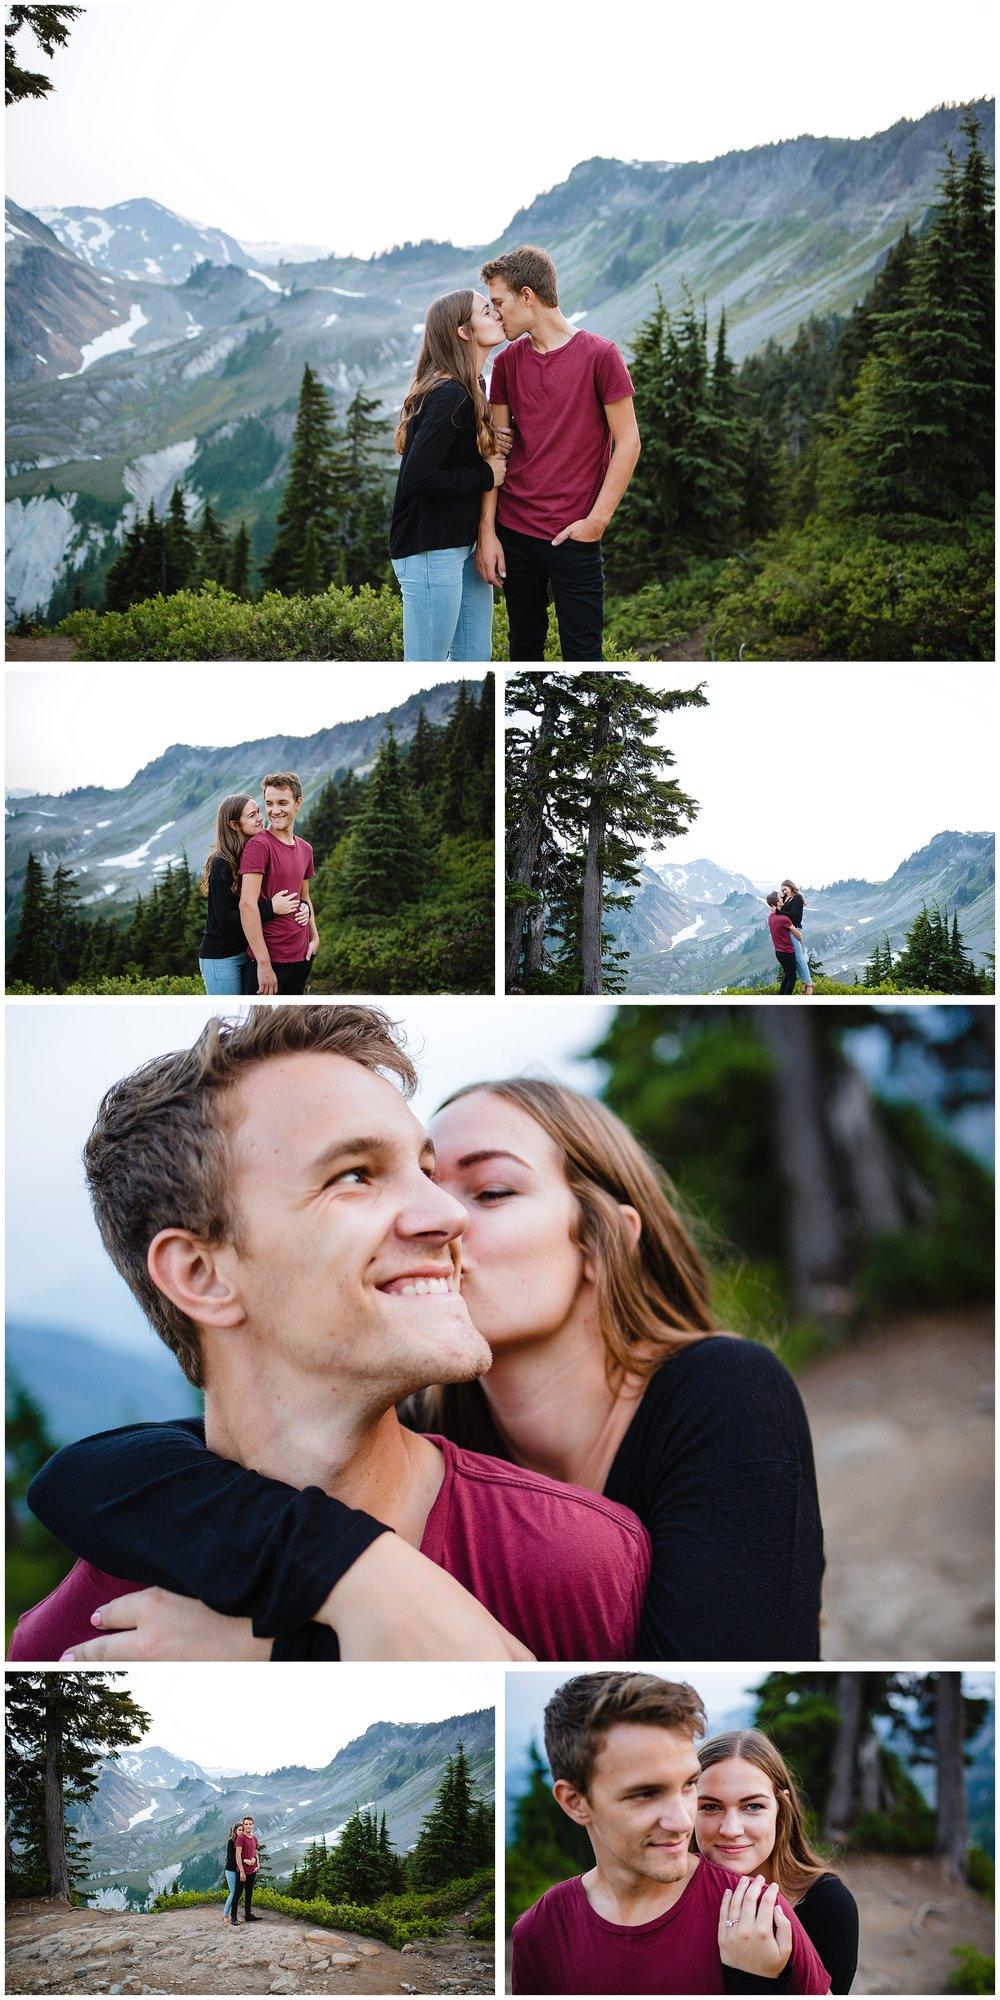 Mt Baker Artist Point Engagement Photography Mountain Inspo Couples Photographer Evening Romantic_0007.jpg